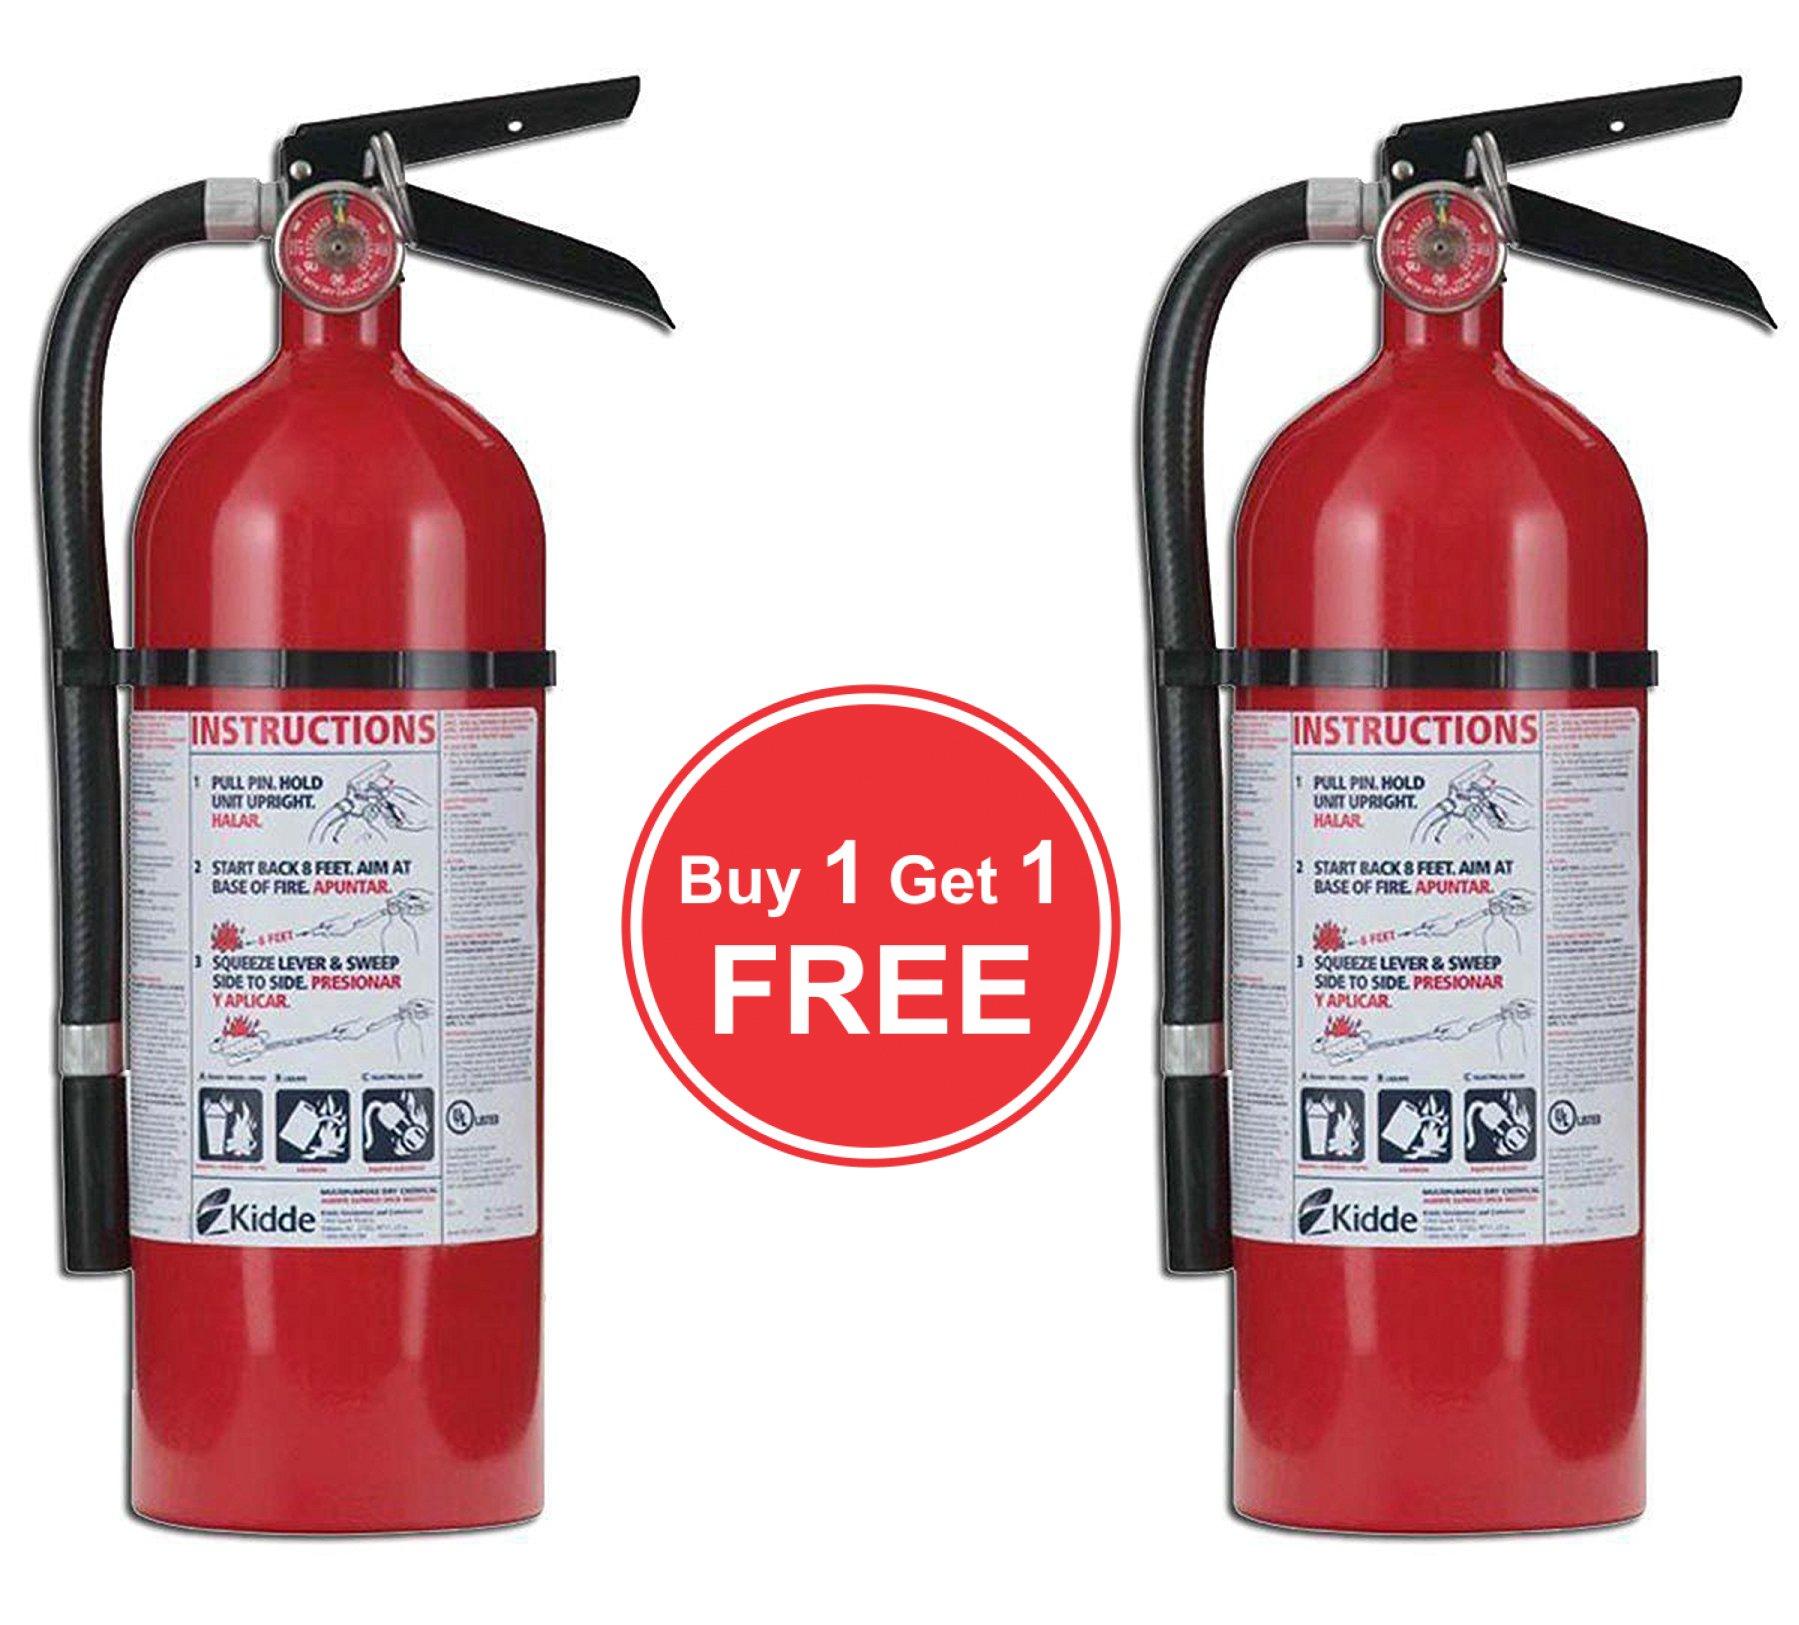 Kidde Pro 21005779 Fire Extinguisher, 4 lb, 2-A, 10-B:C